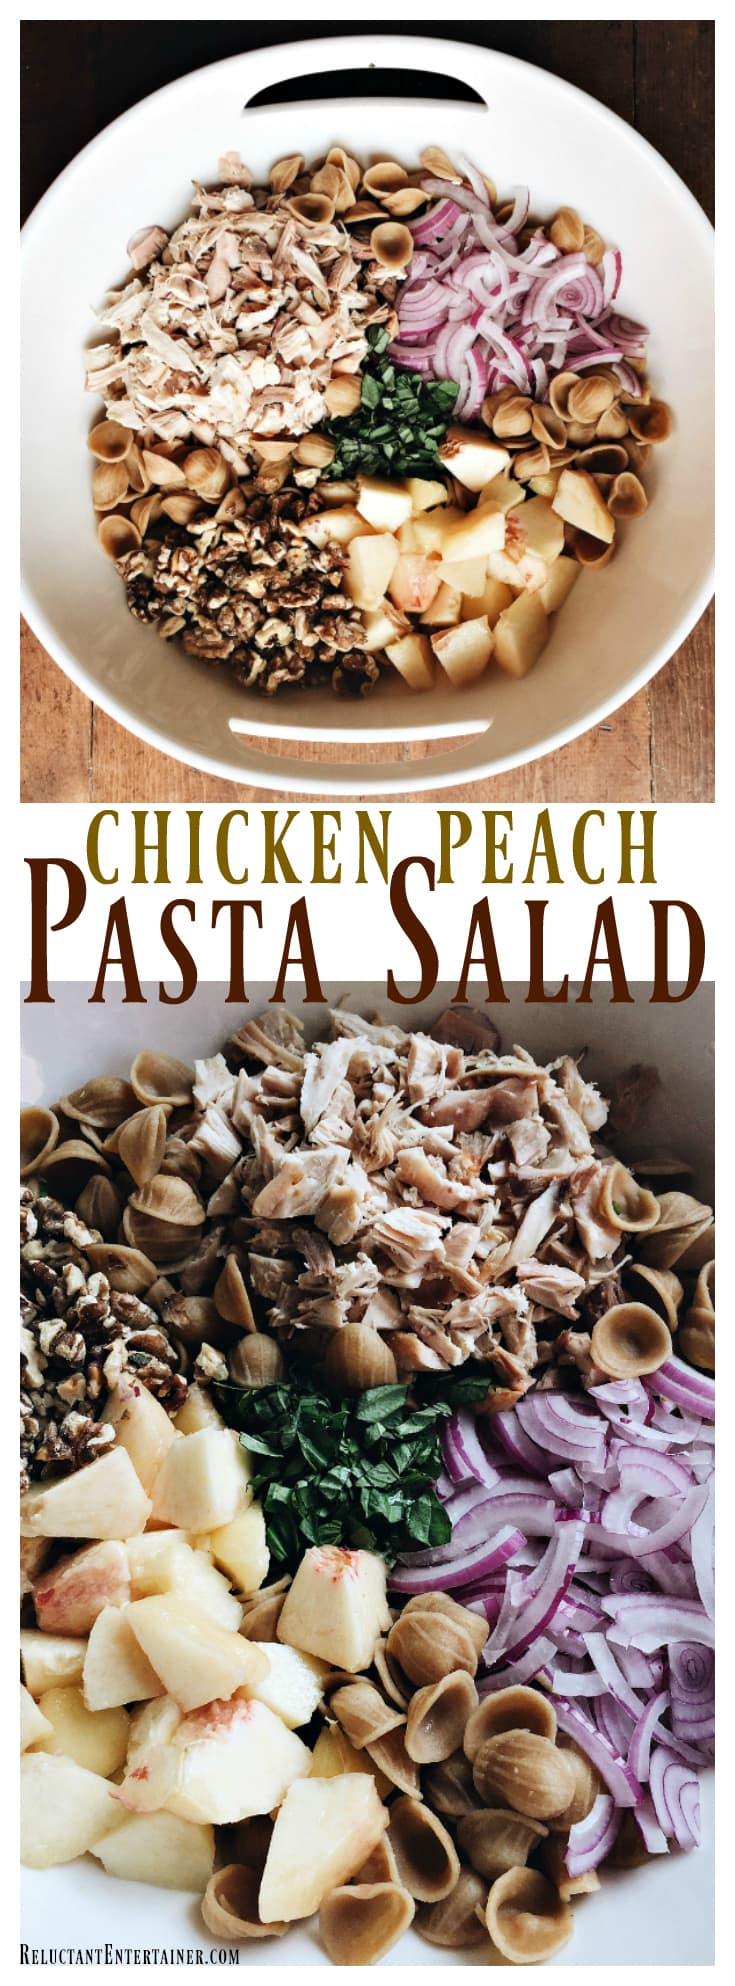 Chicken Peach Pasta Salad for summer entertaining   ReluctantEntertainer.com